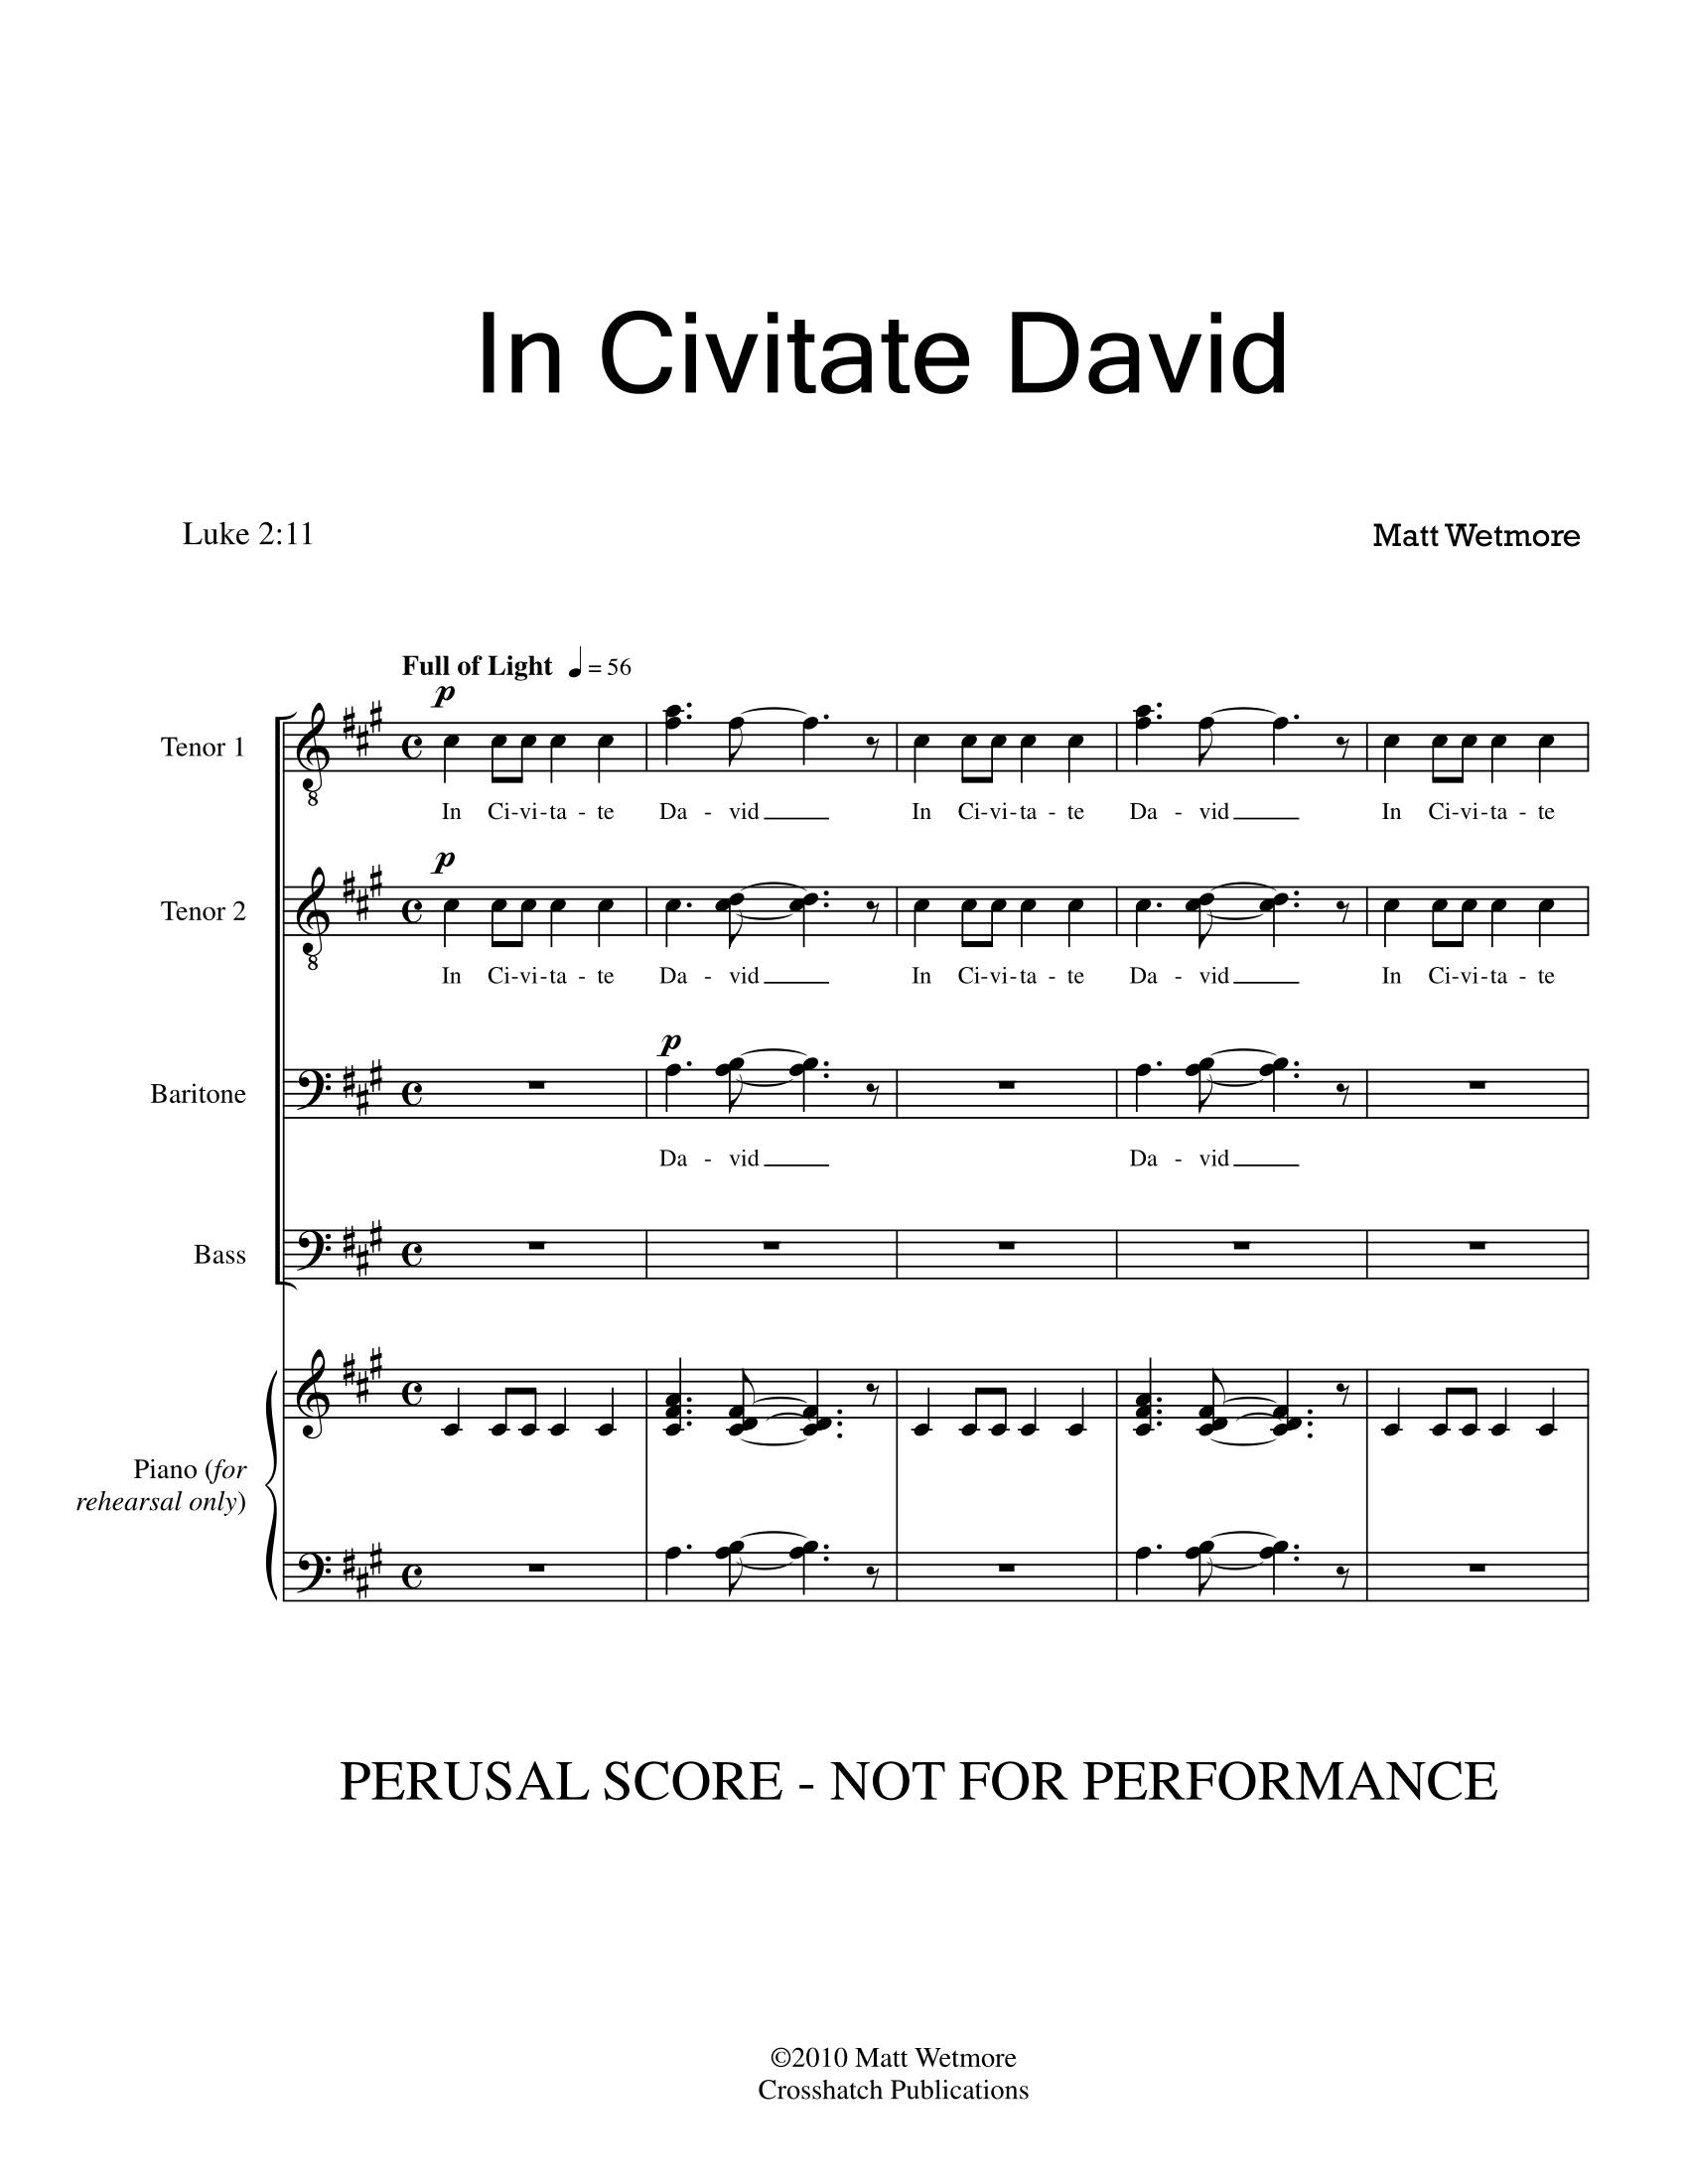 In Civitate David Perusal-3.png